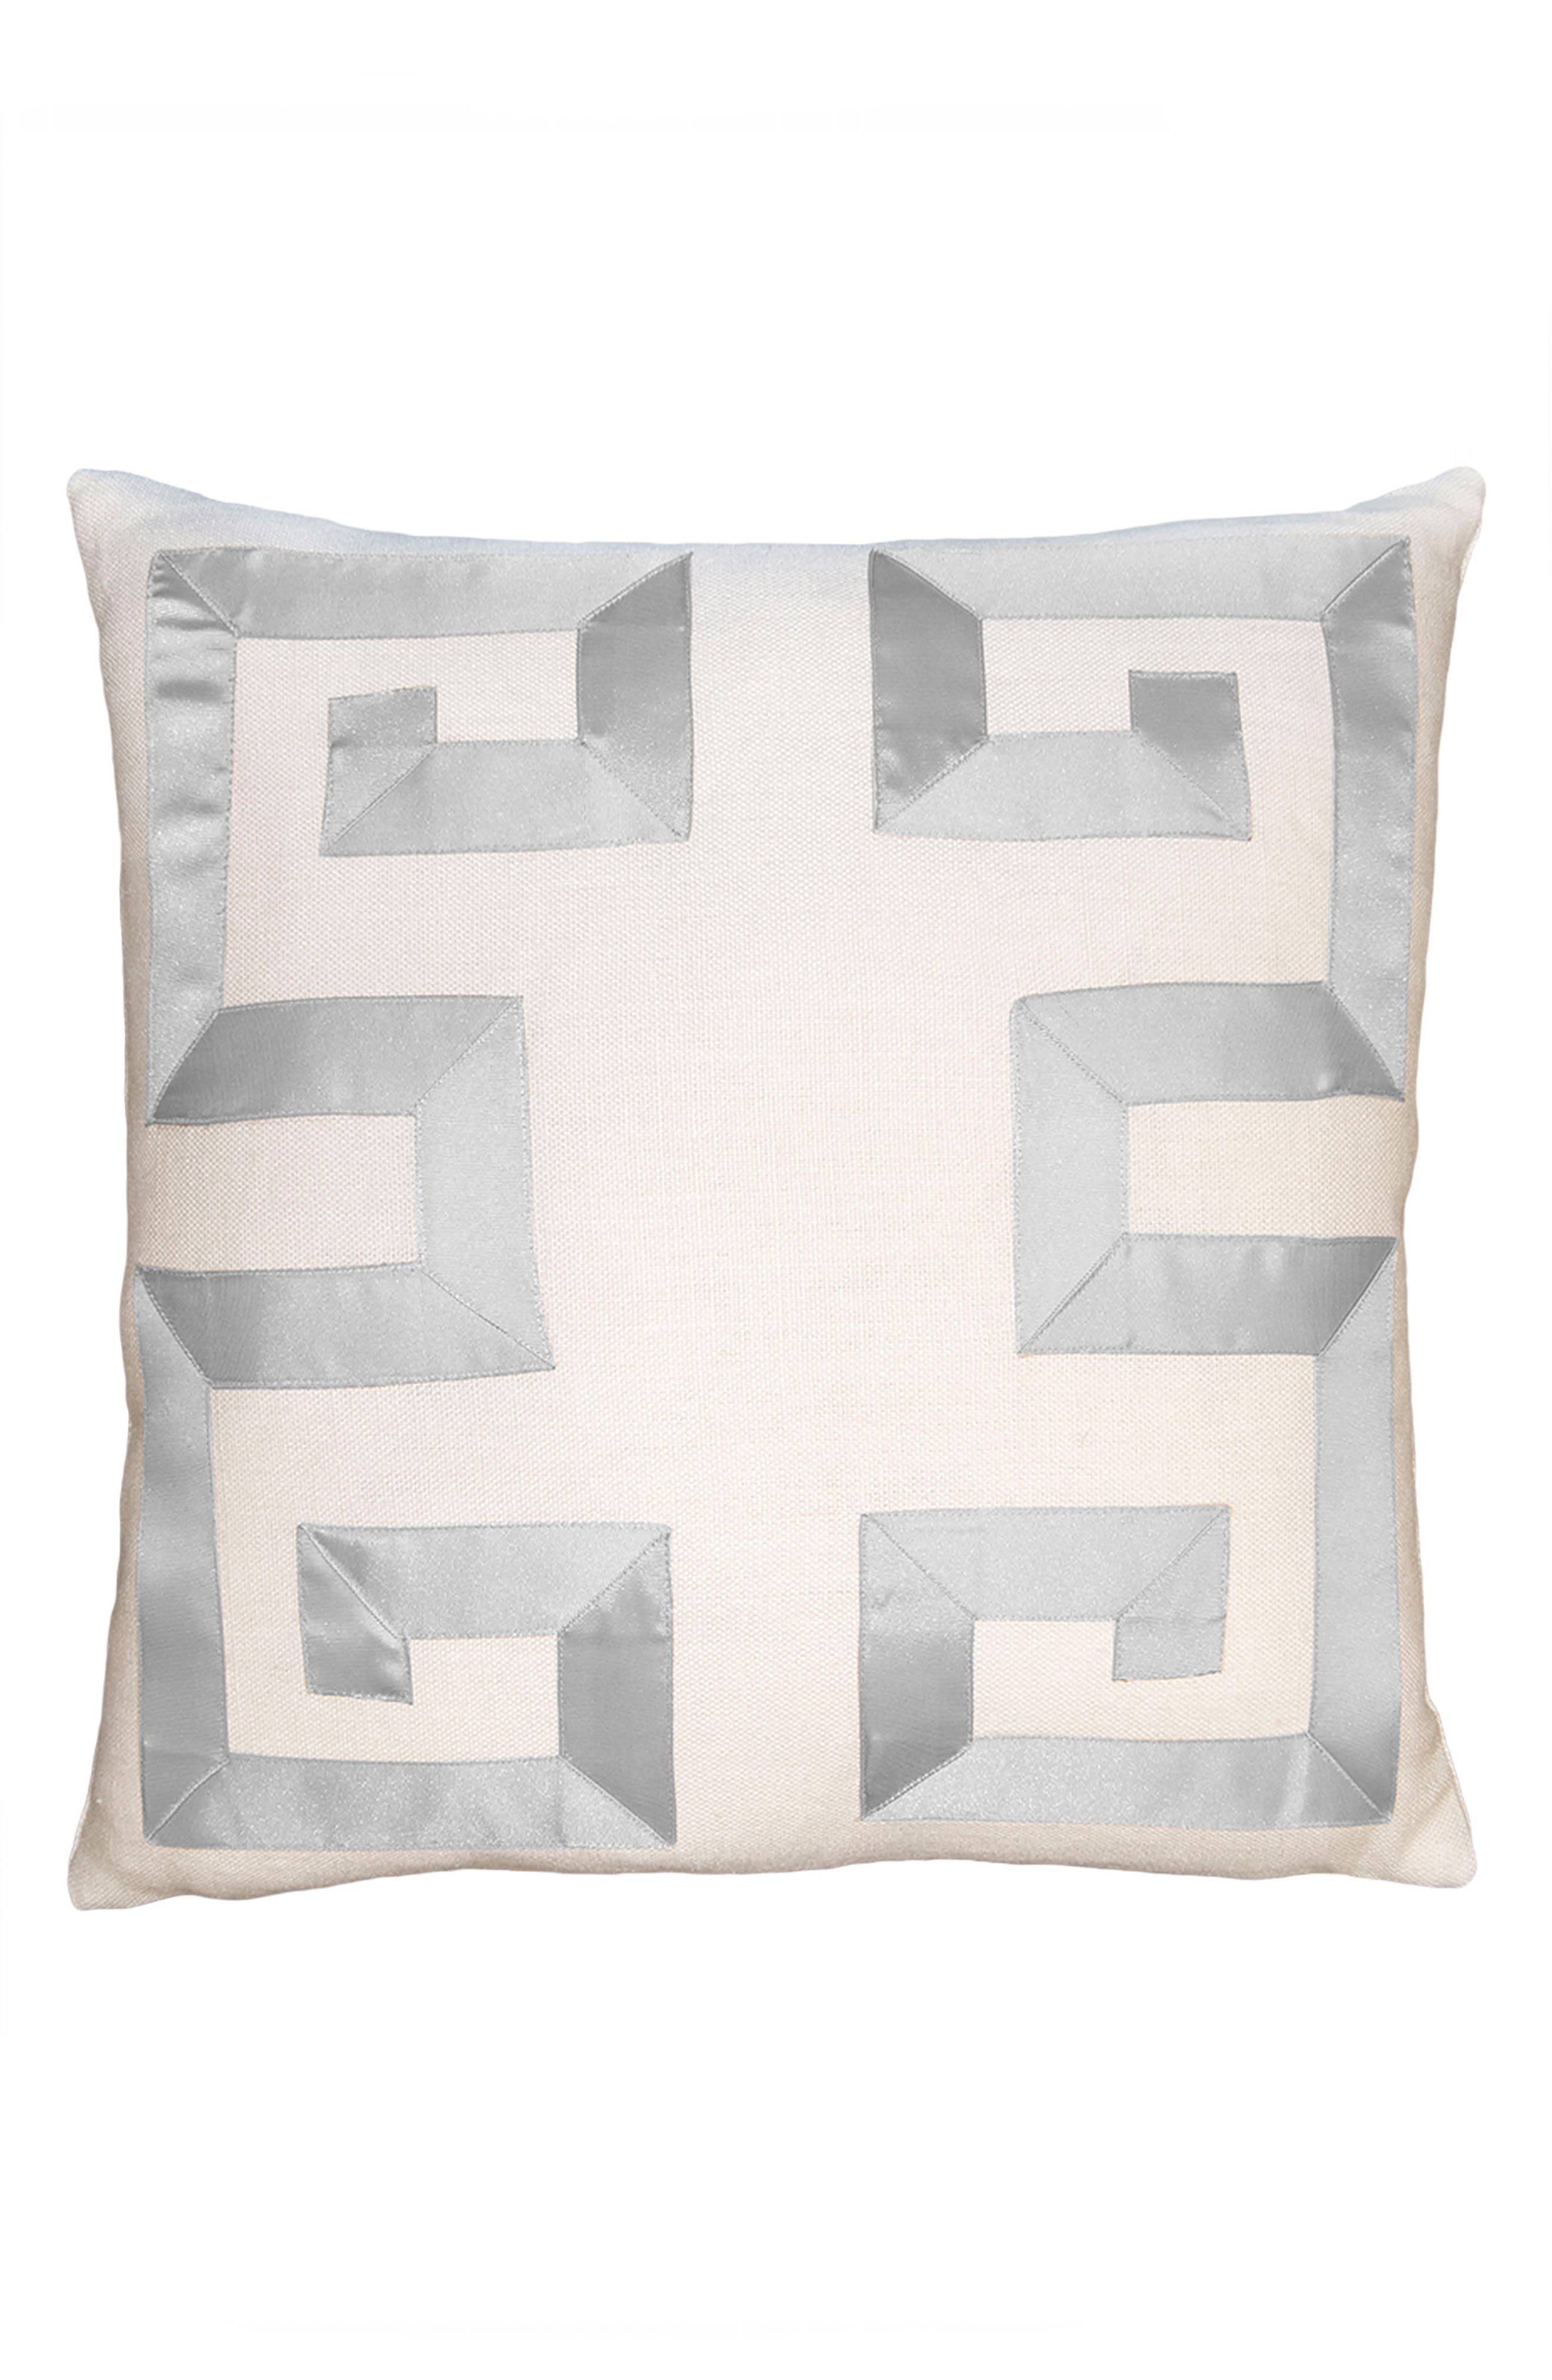 Empire Birch Accent Pillow,                         Main,                         color, SILVER